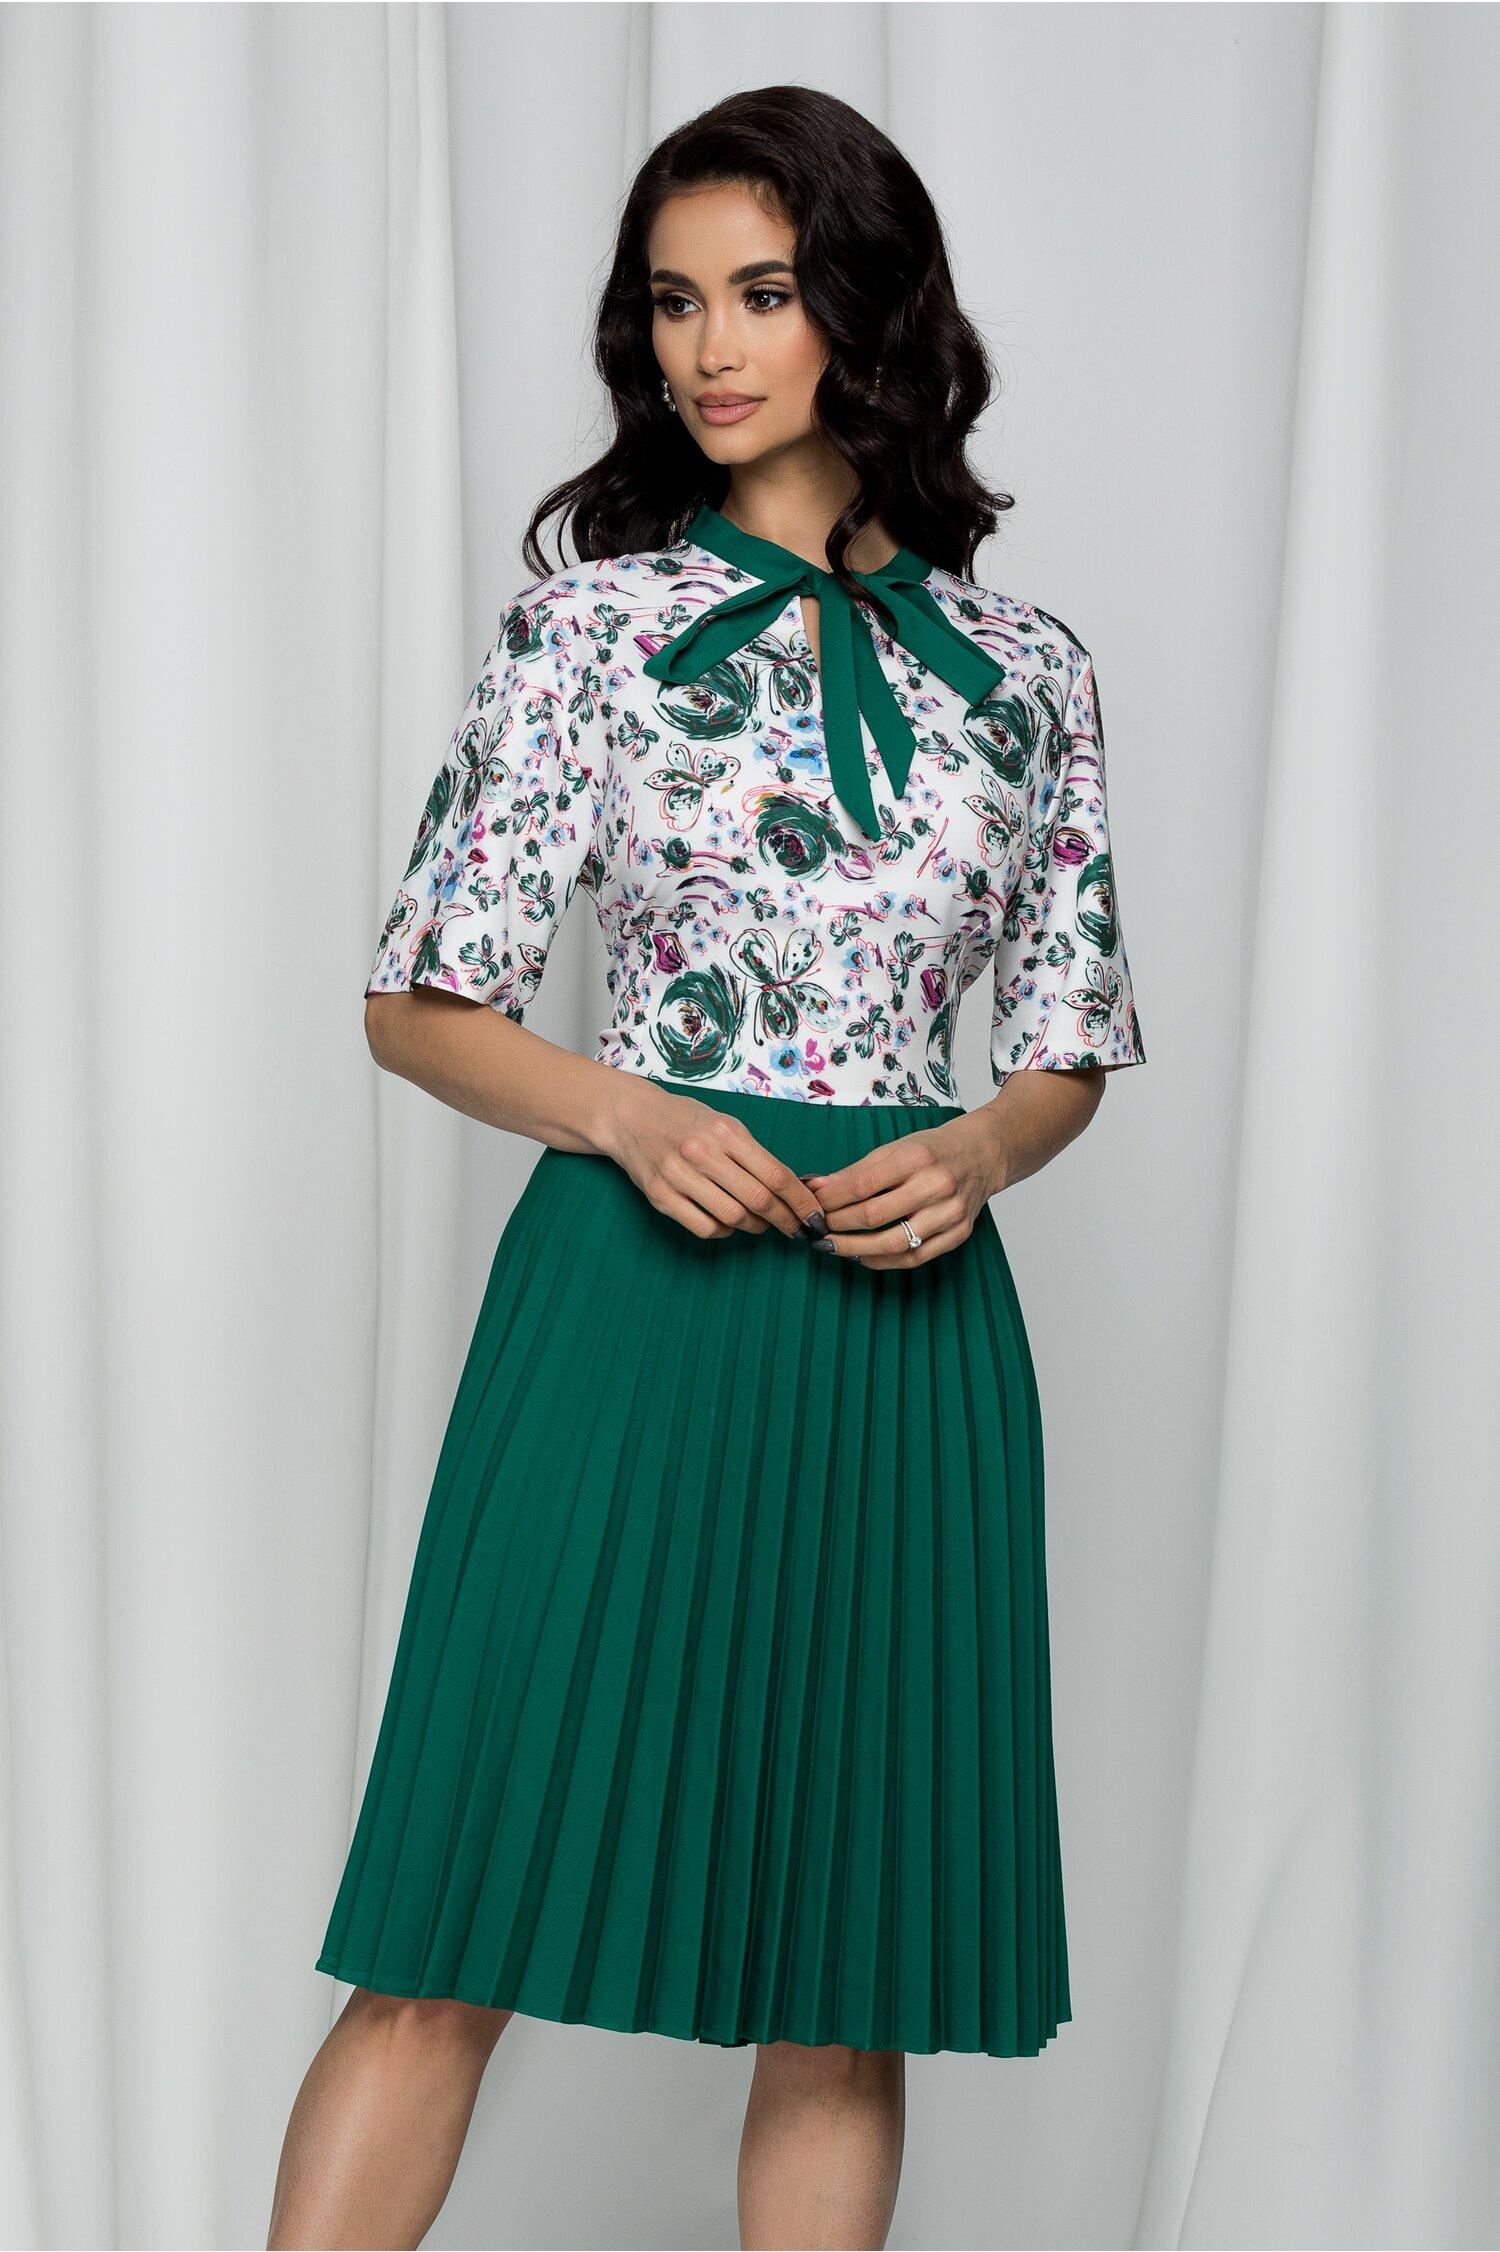 Rochie Eloise verde cu imprimeu floral si pliuri pe fusta